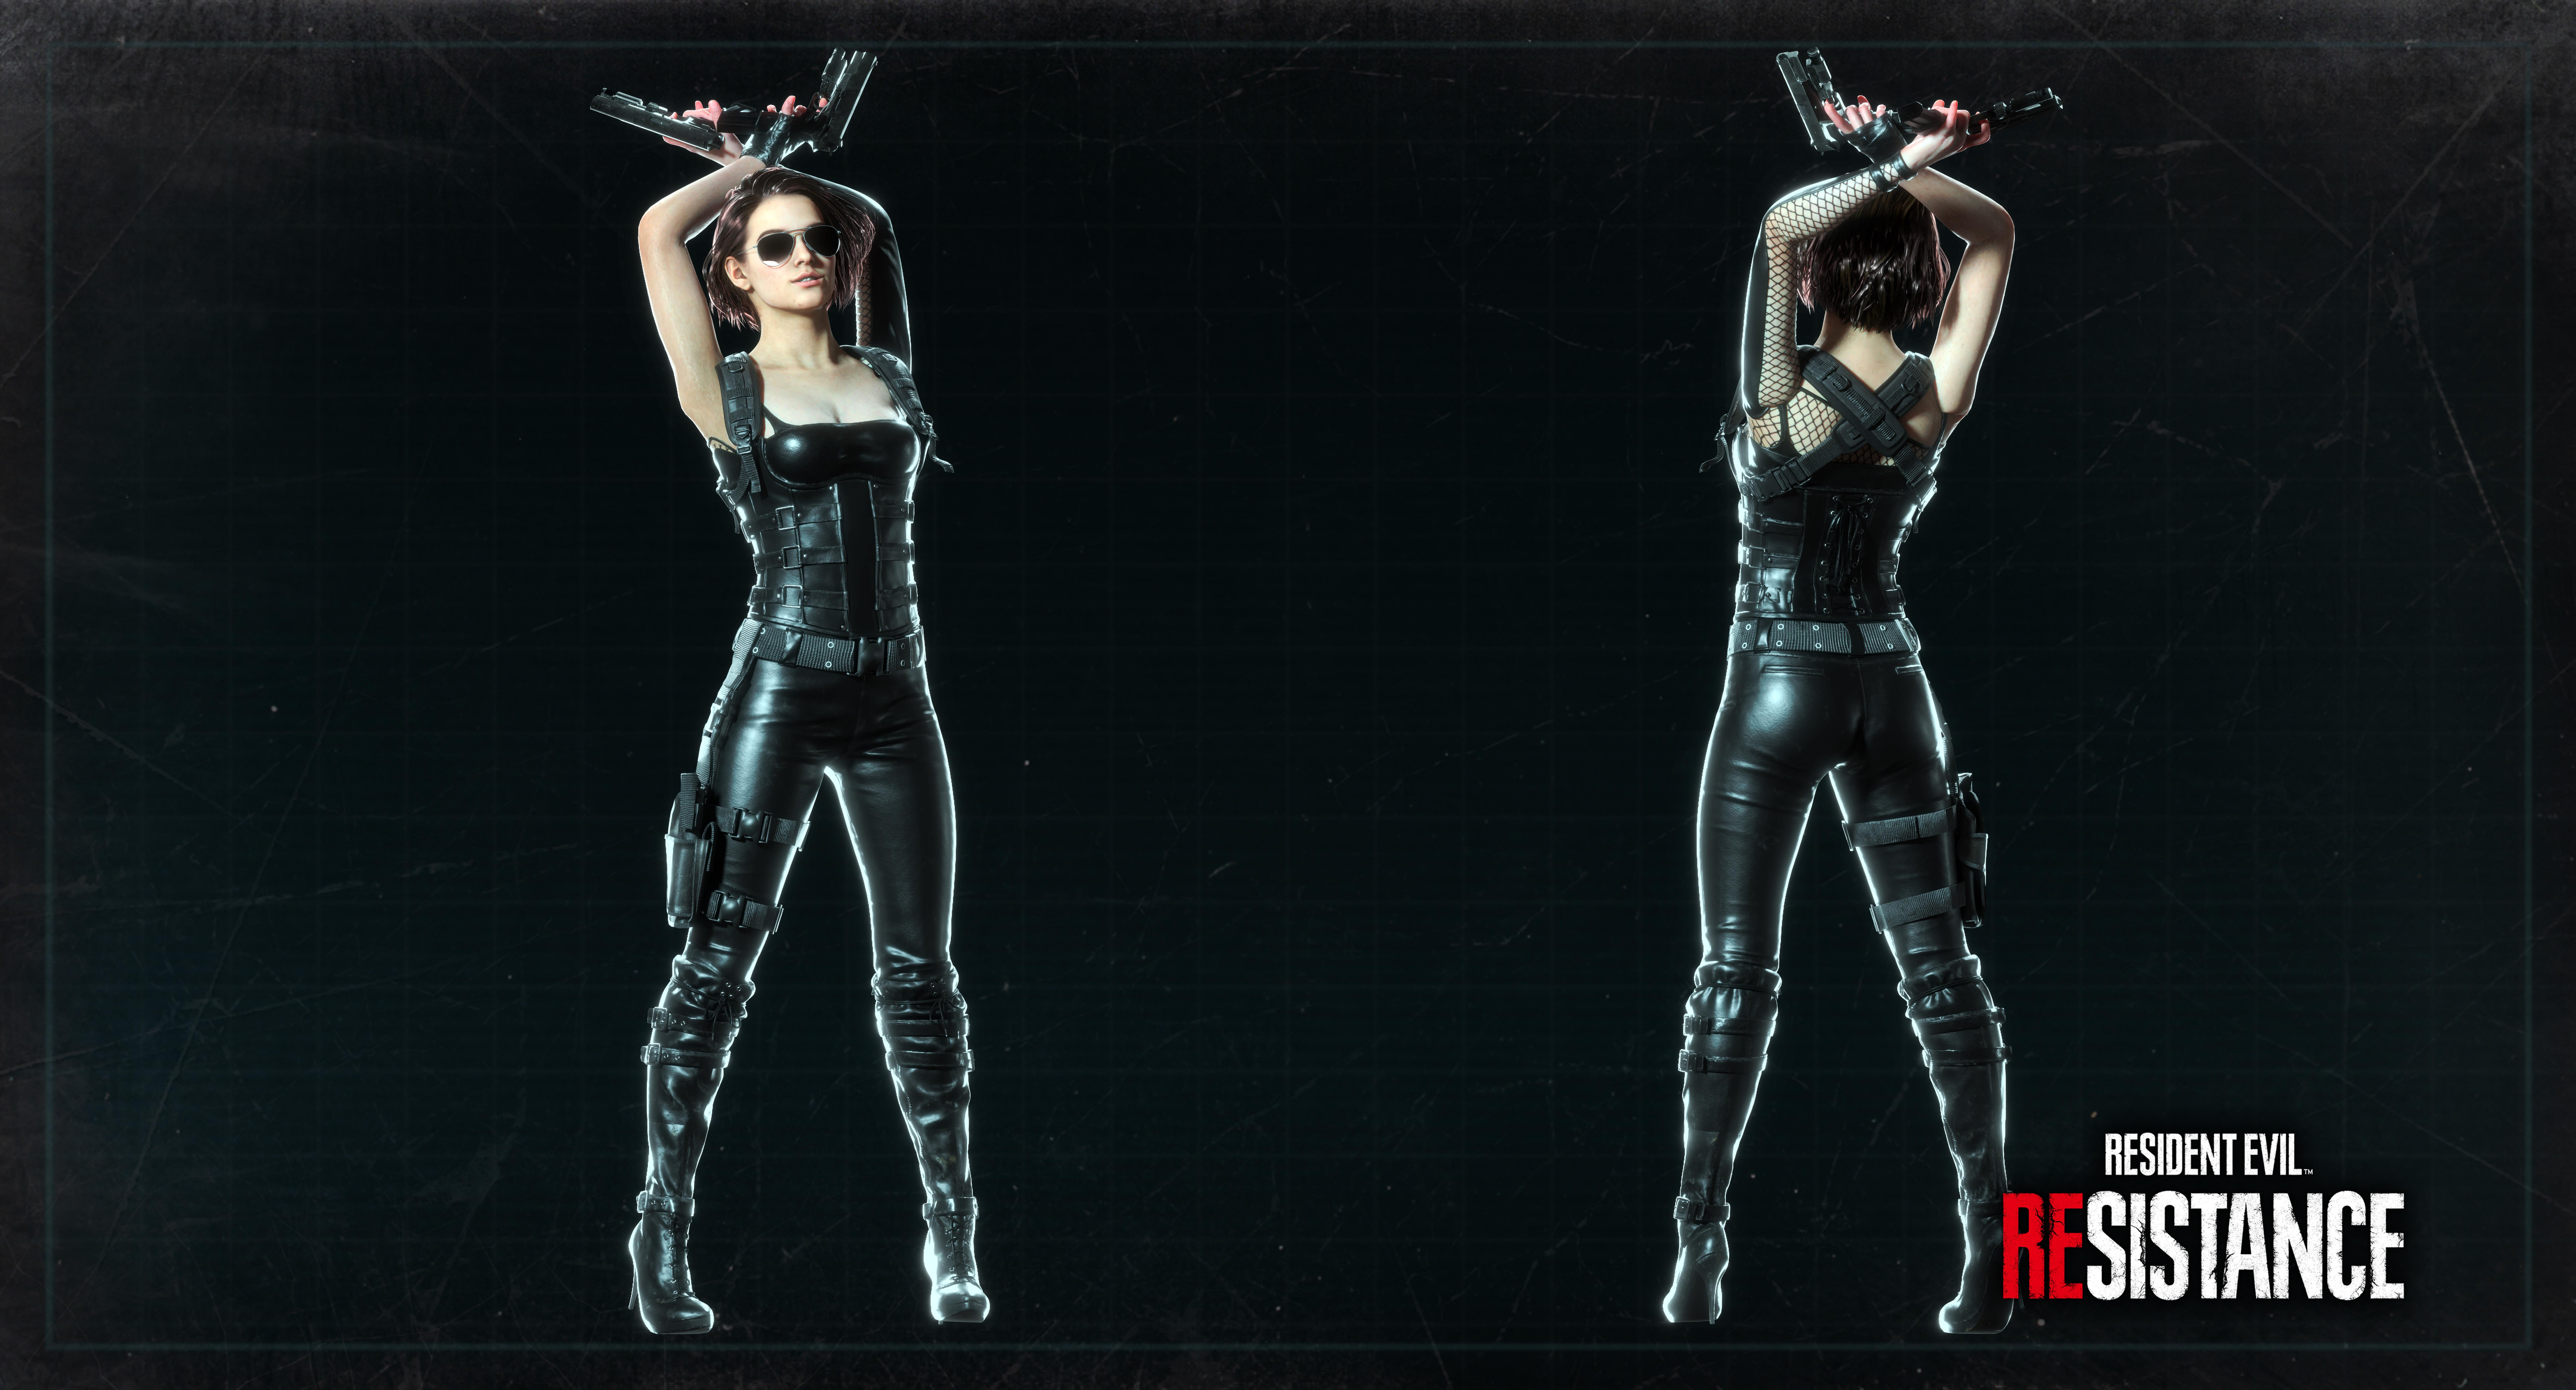 Resident Evil Resistance Jill Retribution Xps By Kanbara914 On